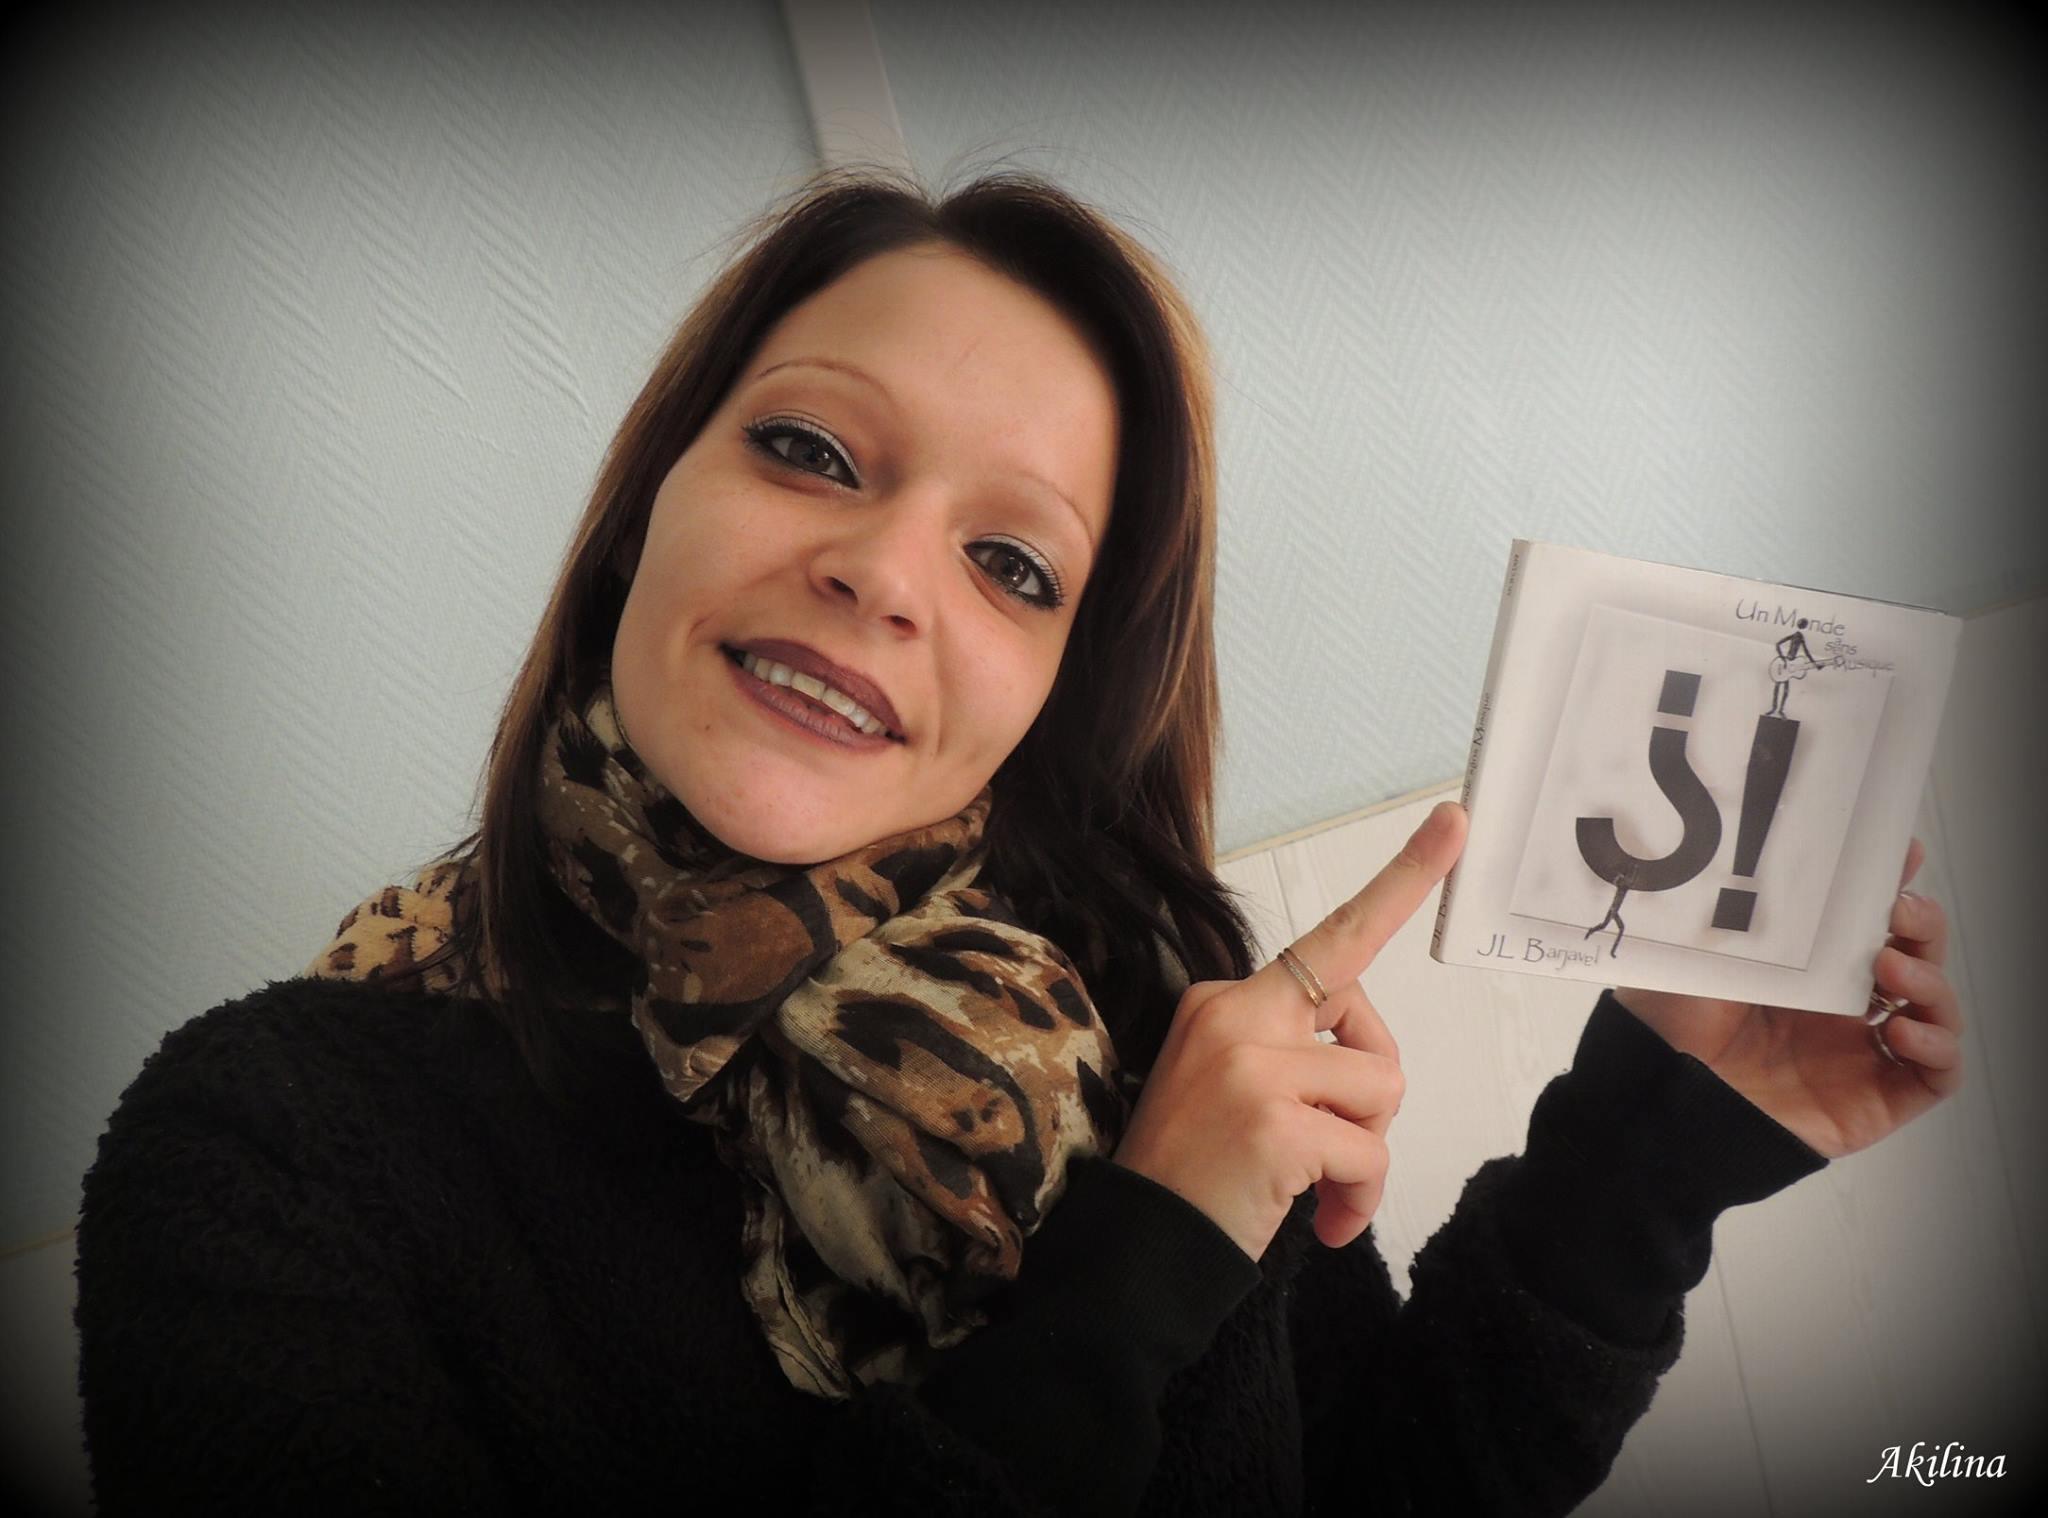 JL Album by Sylvia 163.jpg